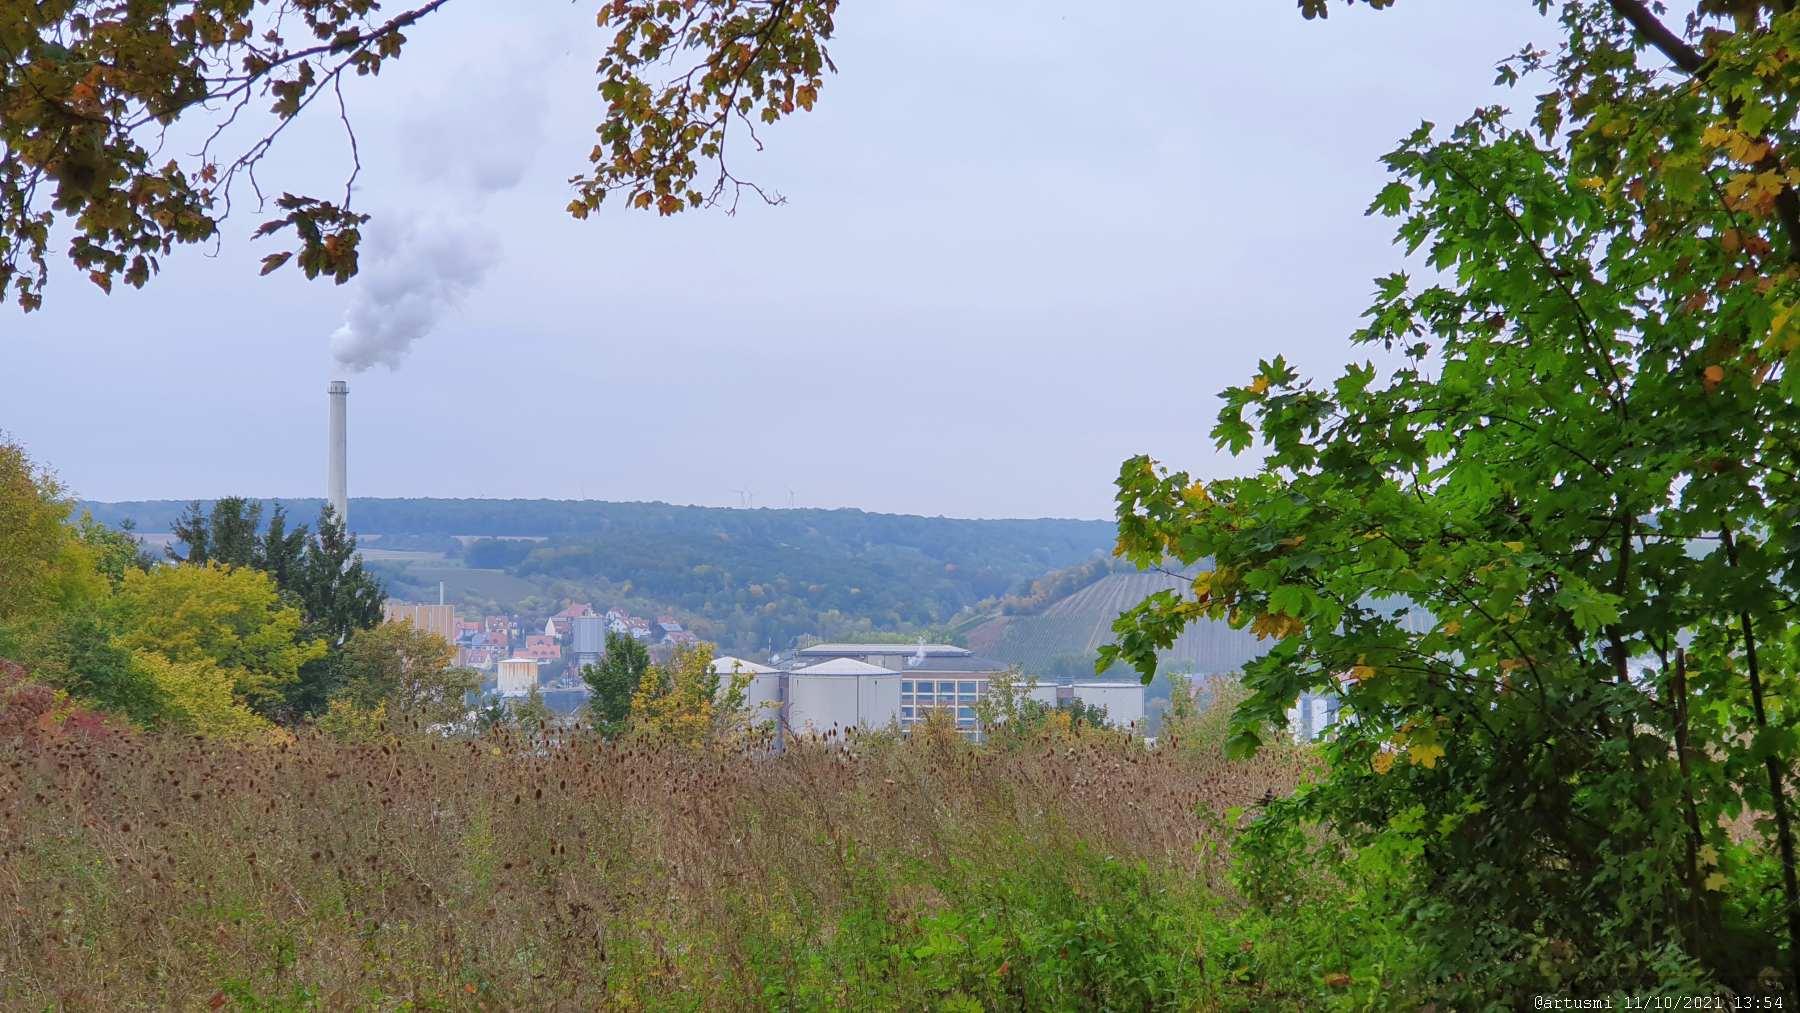 Zuckerfabrik in Ochsenfurt am Main